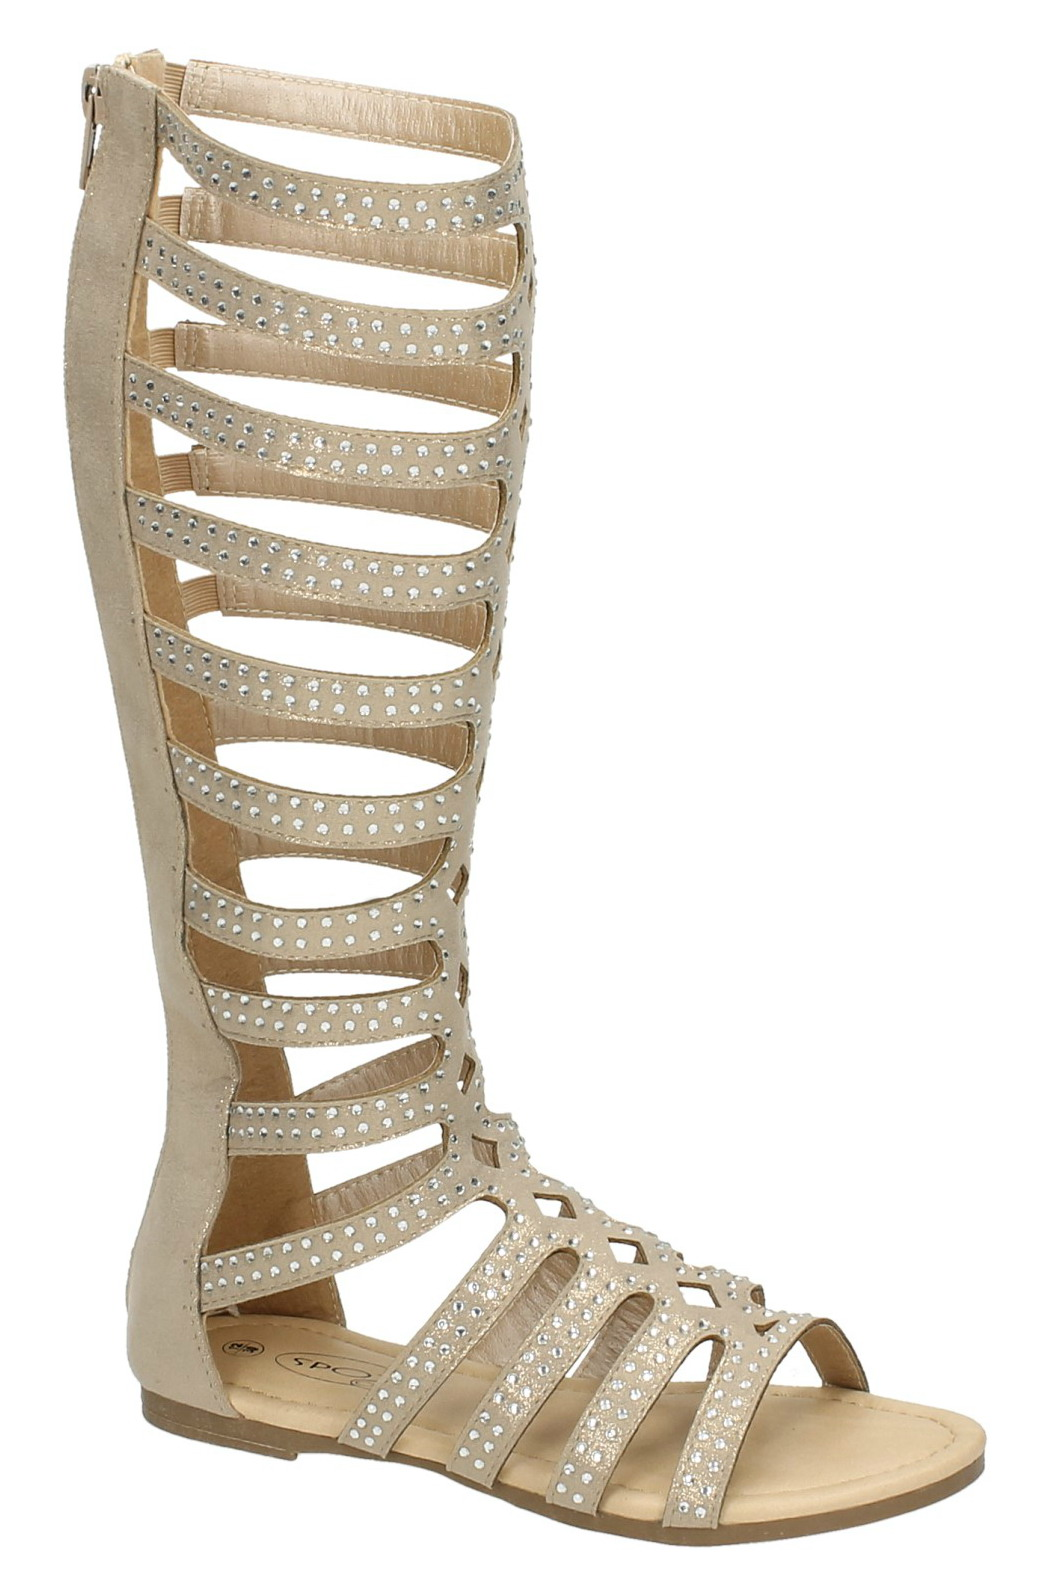 d479e22bab0d8f Girls Tall Knee High Strappy Gladiator Sandals Flat Diamante Summer ...